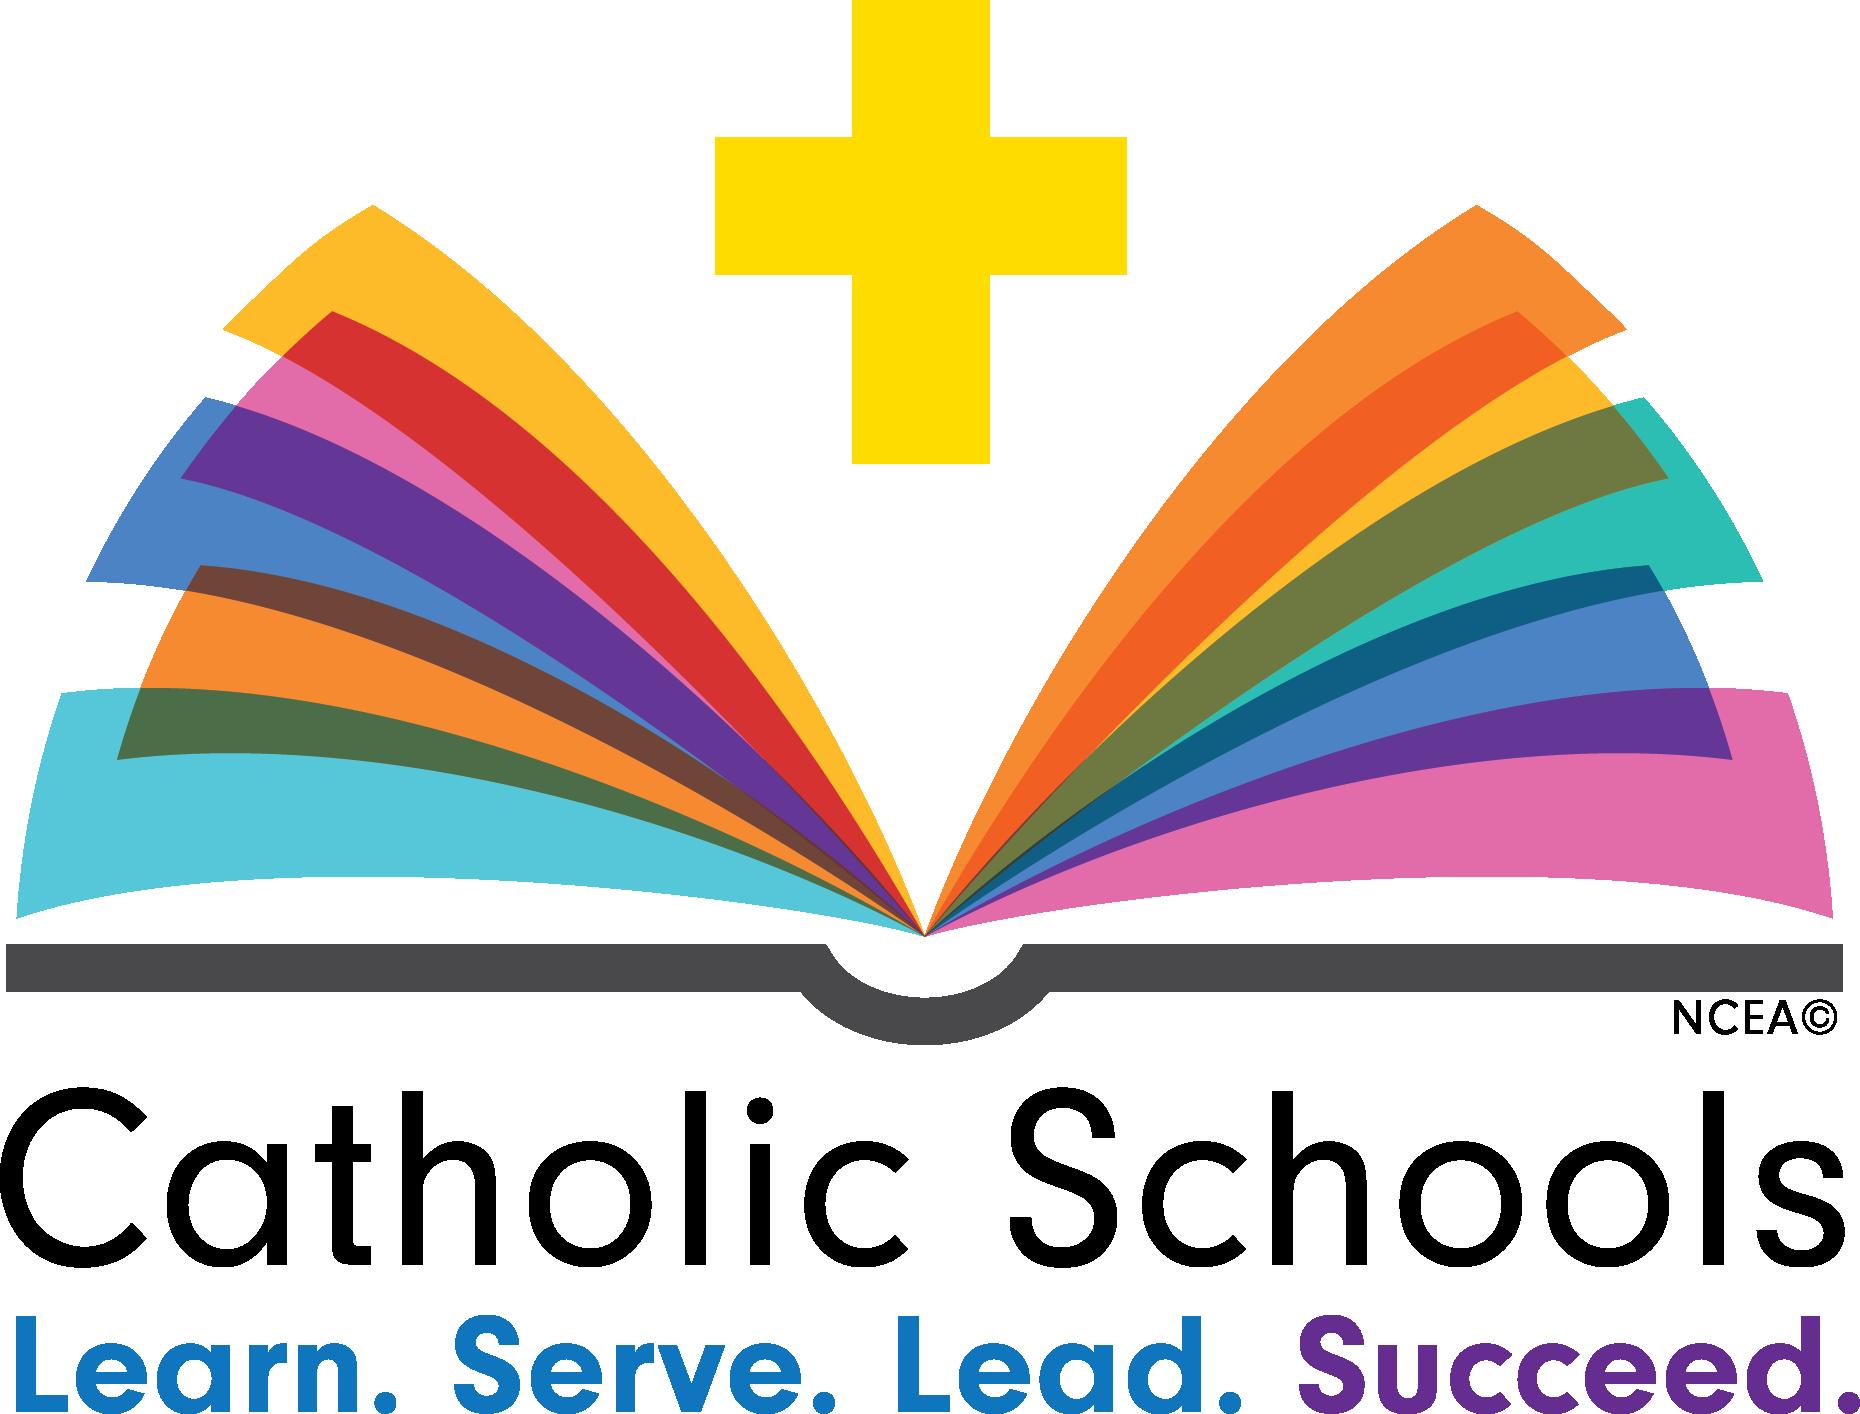 Future clipart guideline. Catholic schools week logos